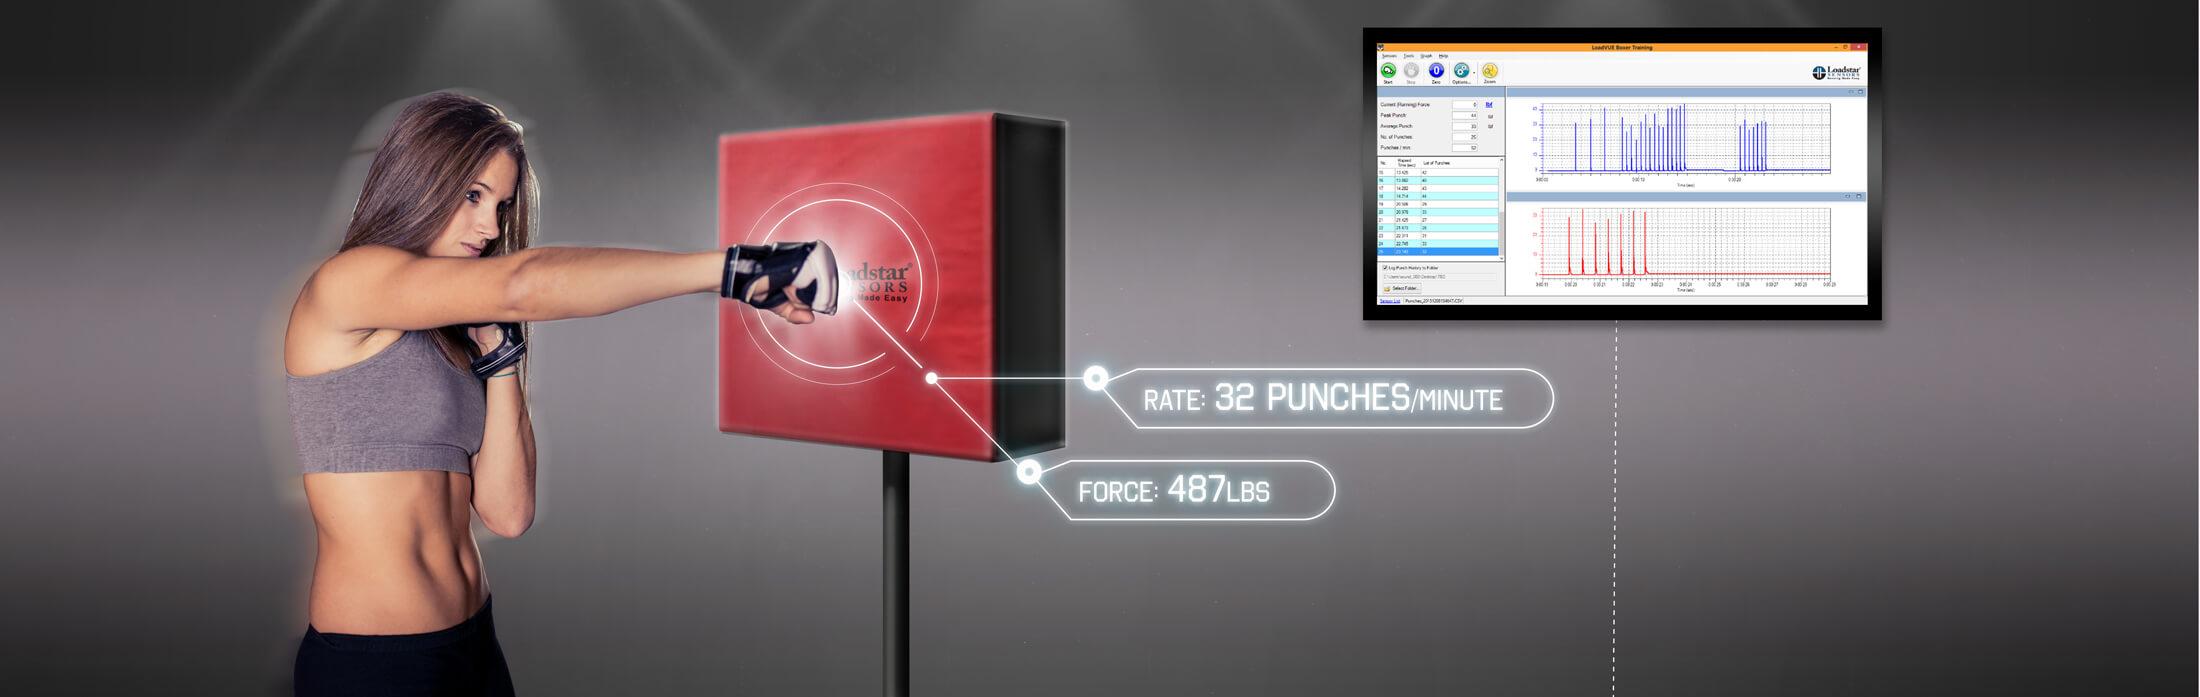 Punch and Kick Force Sensor | Loadstar Sensors